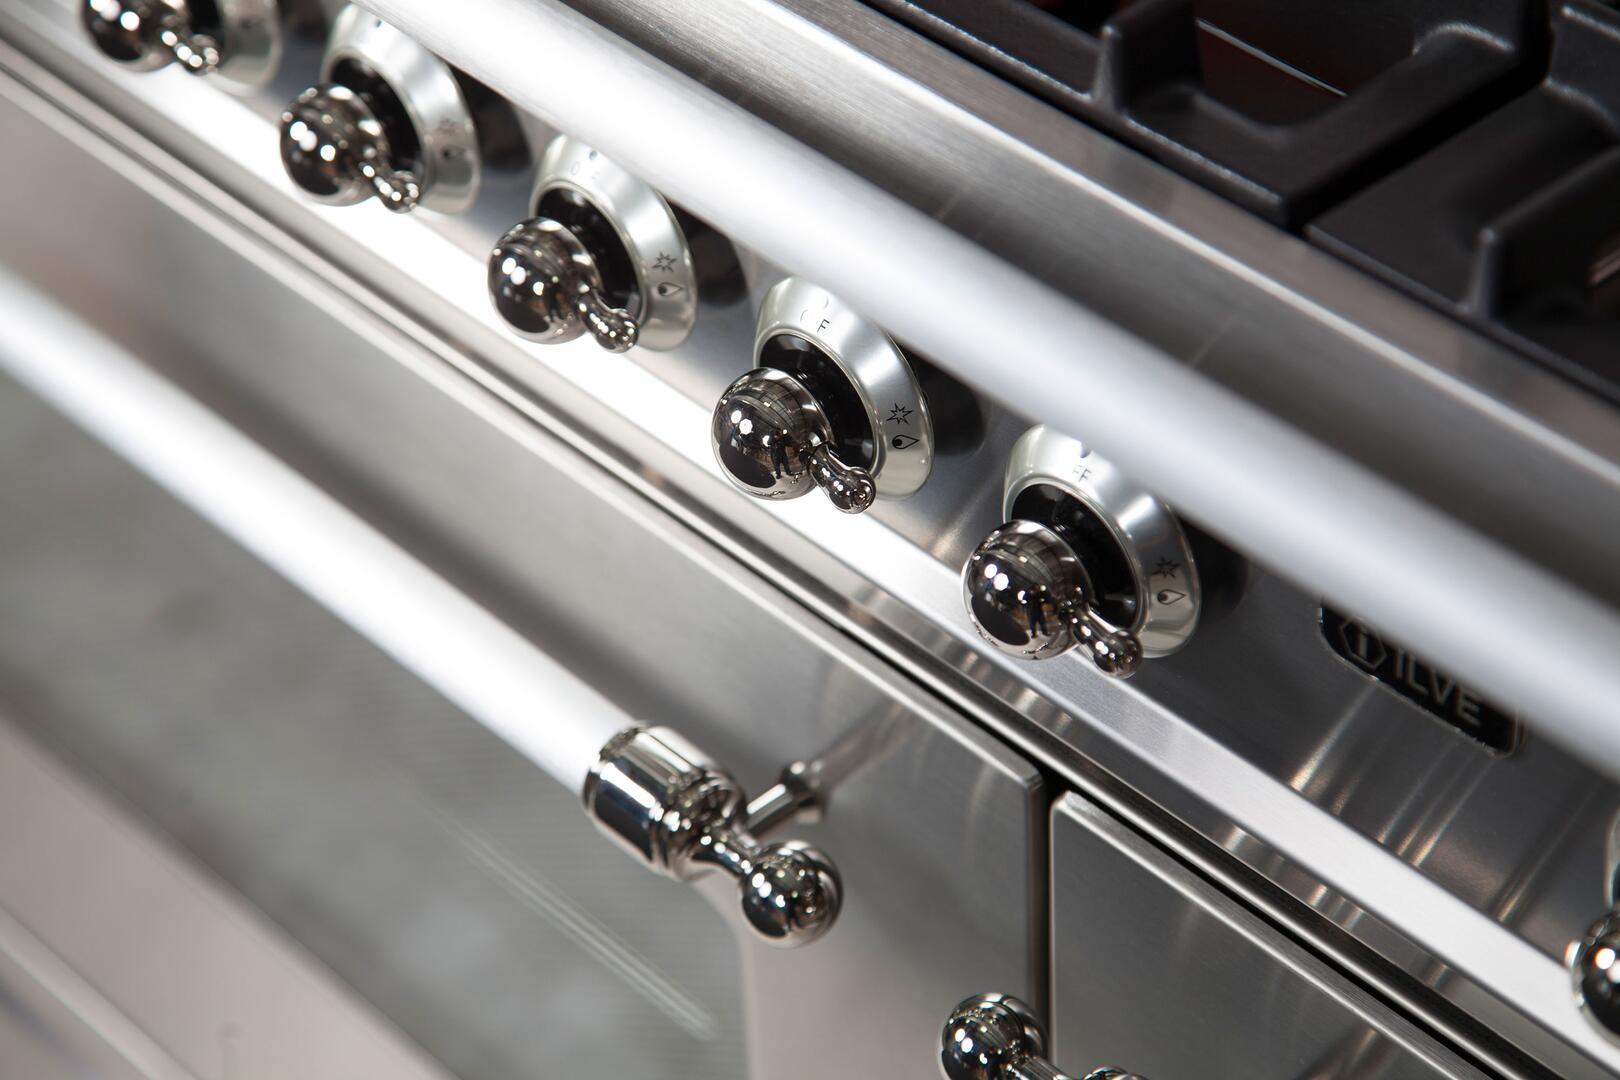 Ilve Nostalgie UPN90FDMPIX Freestanding Dual Fuel Range Stainless Steel, UPN90FDMPIX Details 2